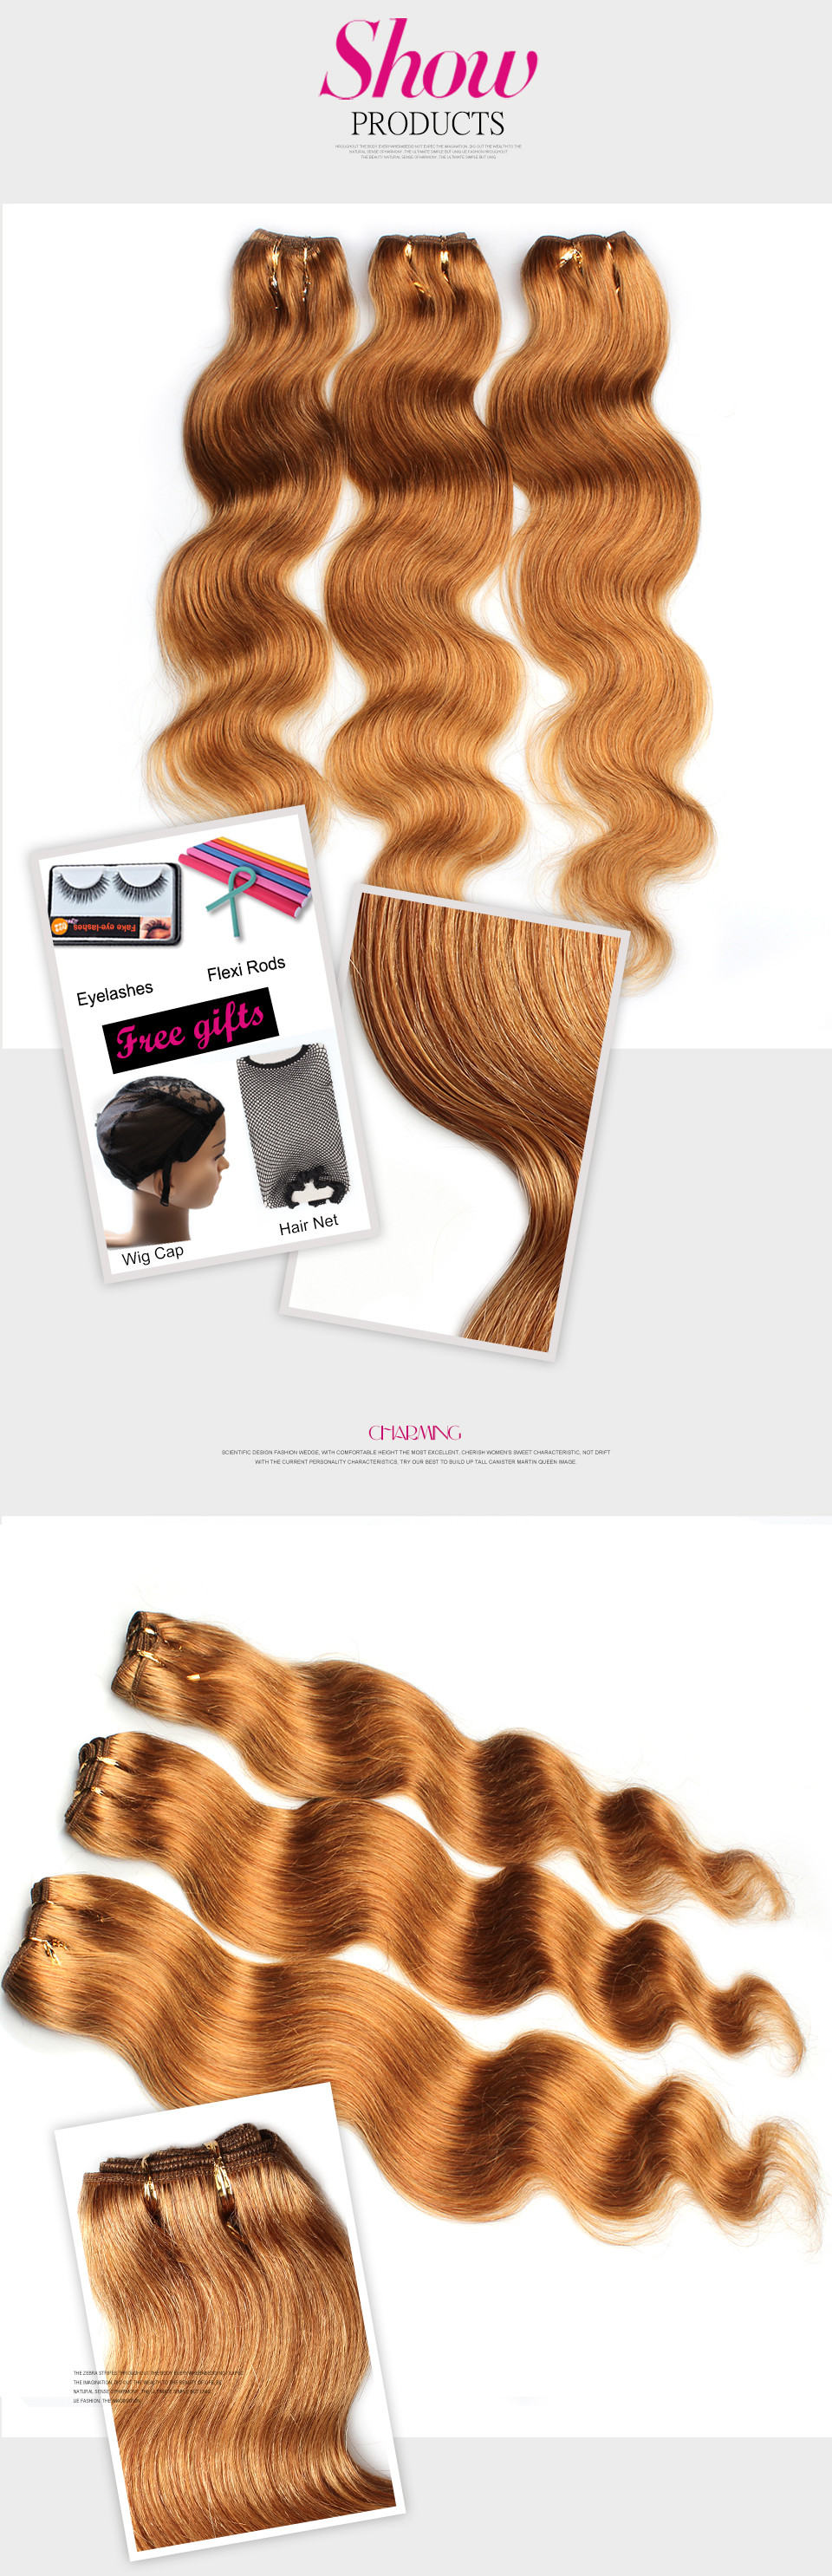 Cheap Brazilian Blonde Hair Body Wave Human Hair Extensions Jerry